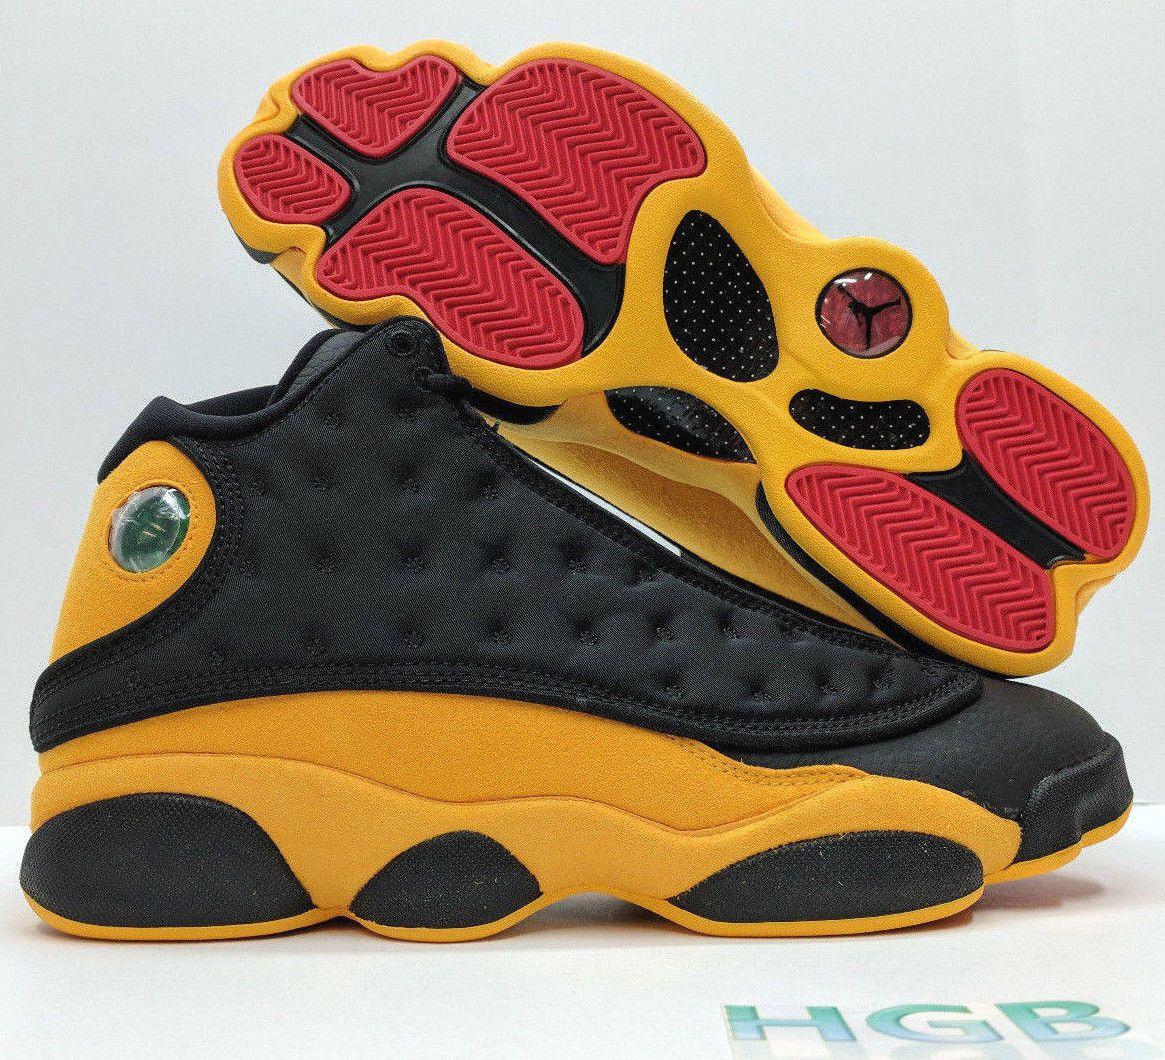 Sneakers men fashion, Shoes sneakers